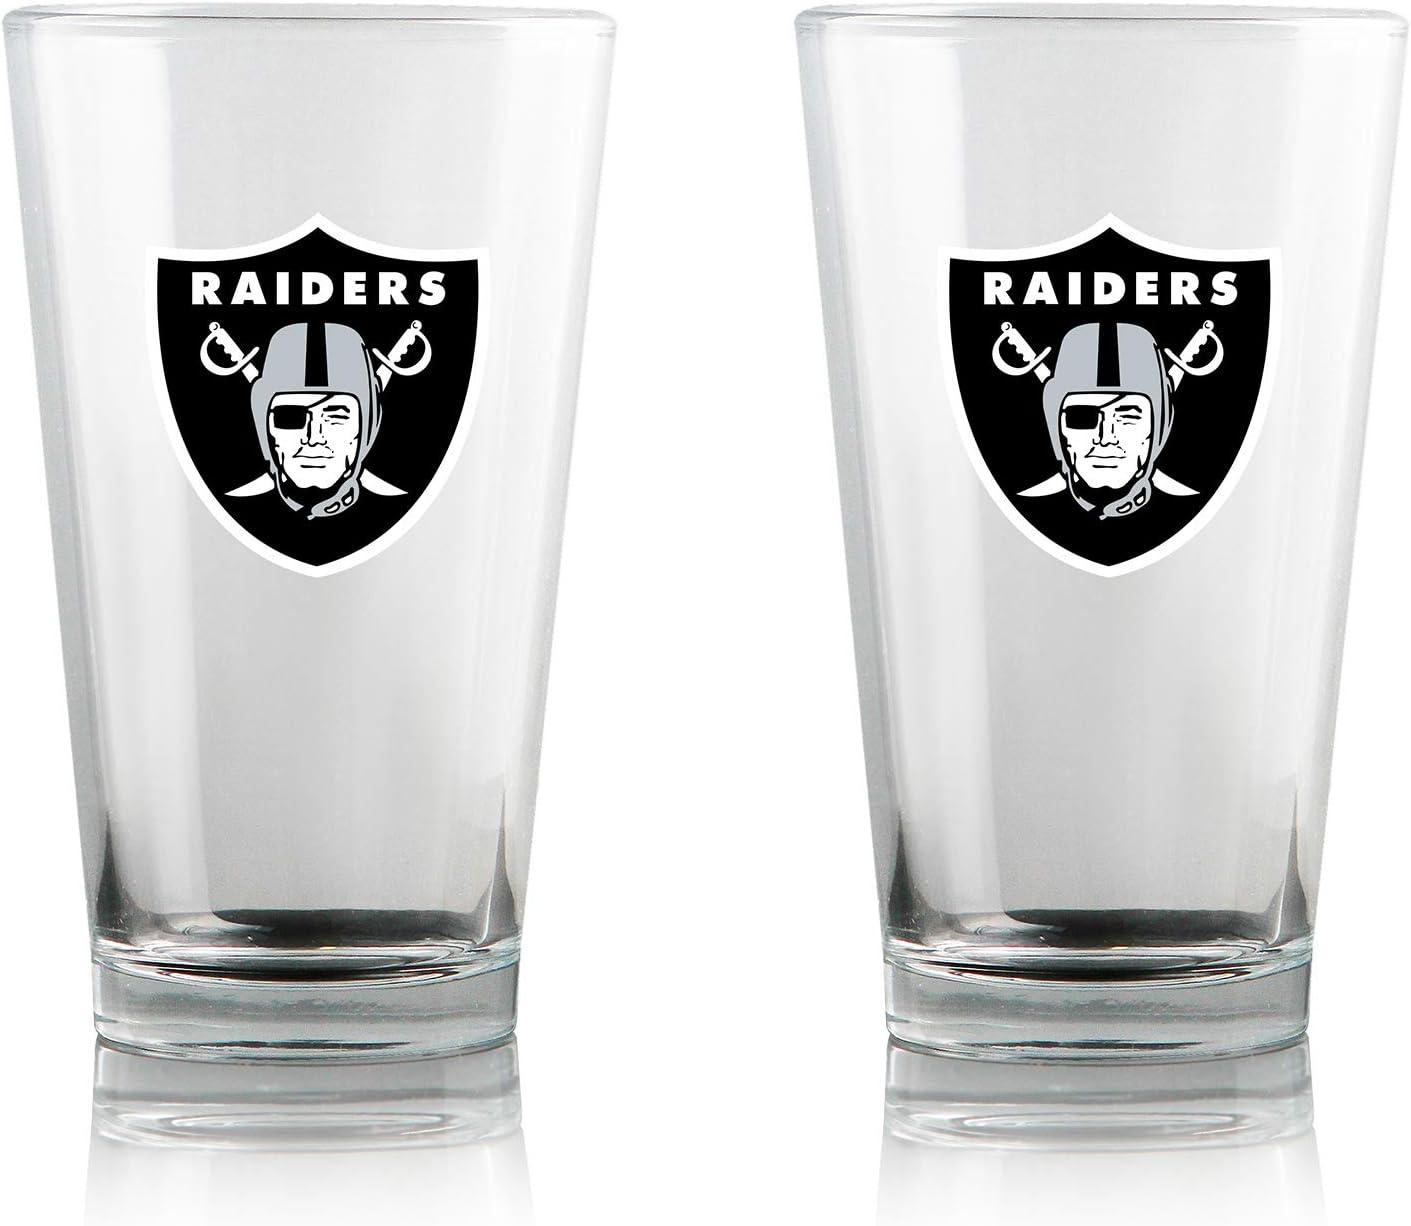 Duck House NFL Clear Highball Pint Glasses | Premium Glassware | Lead-Free | BPA-Free | 16oz | Set of 2